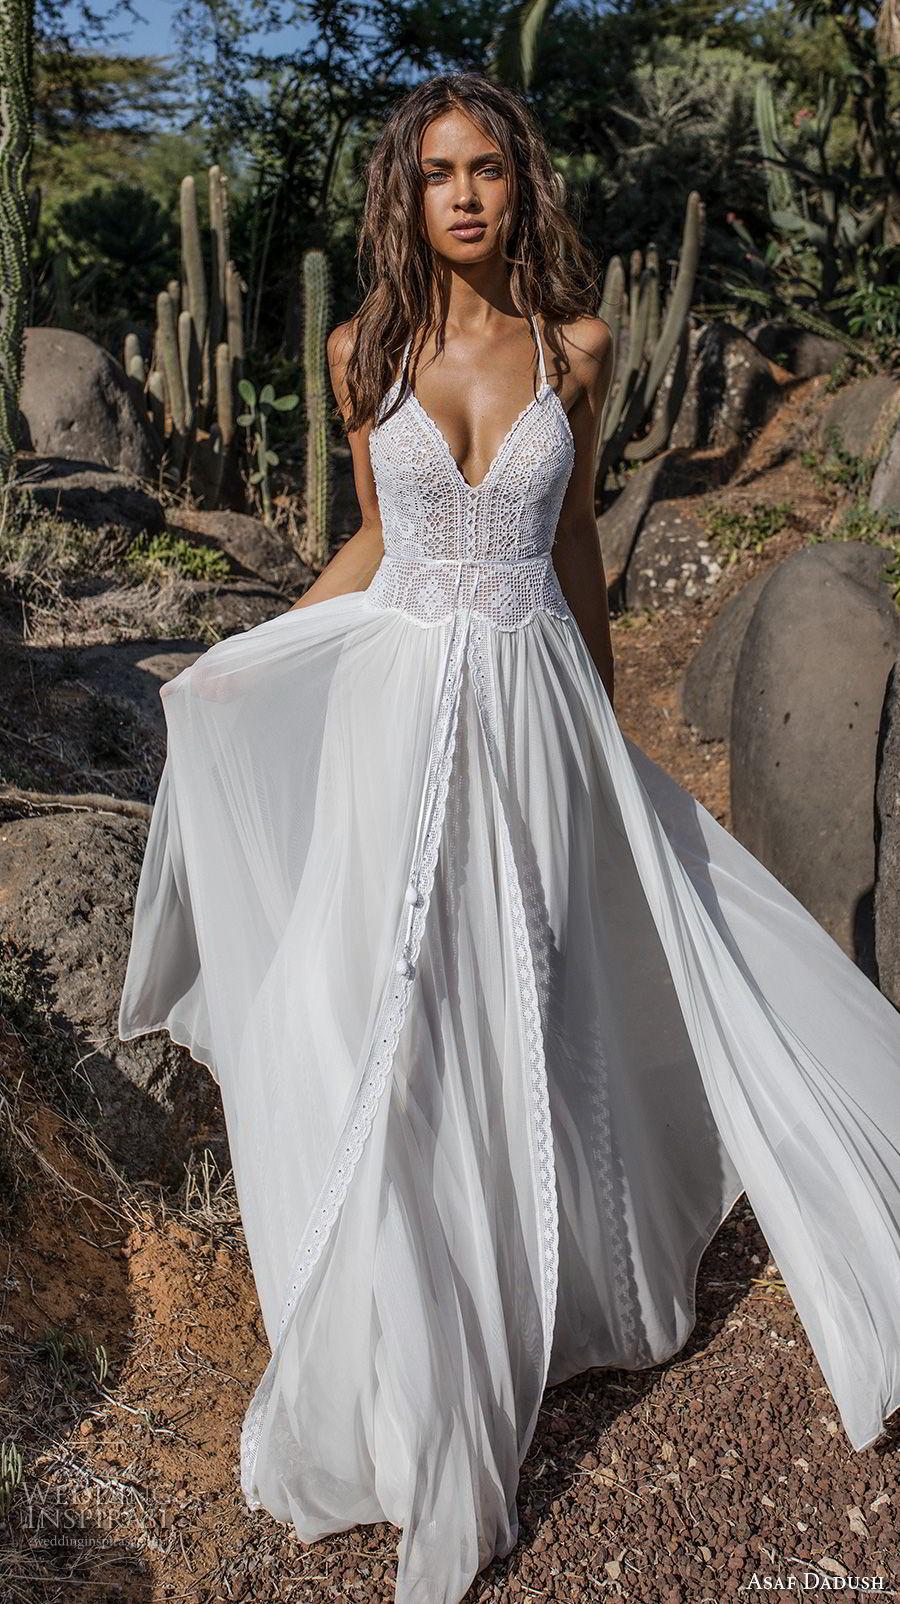 asaf dadush 2018 bridal sleeveless thin strap sweetheart neckline heavily embellished bodice romantic bohemian soft a  line wedding dress open strap back sweep train (1) mv